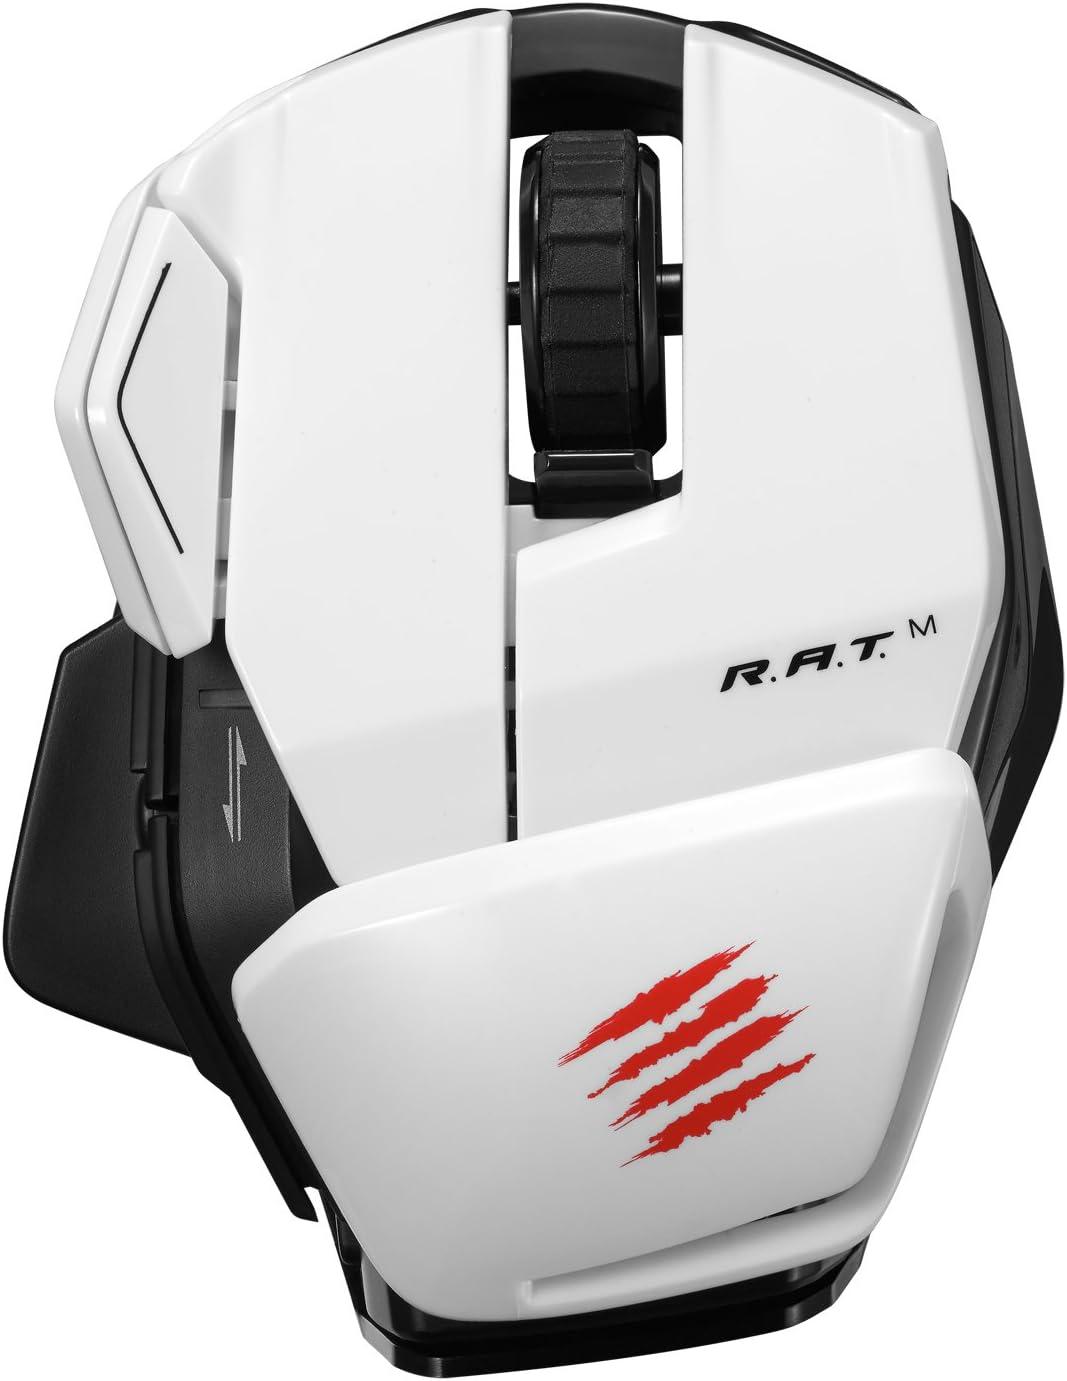 Mad Catz Office RATM - Blanco